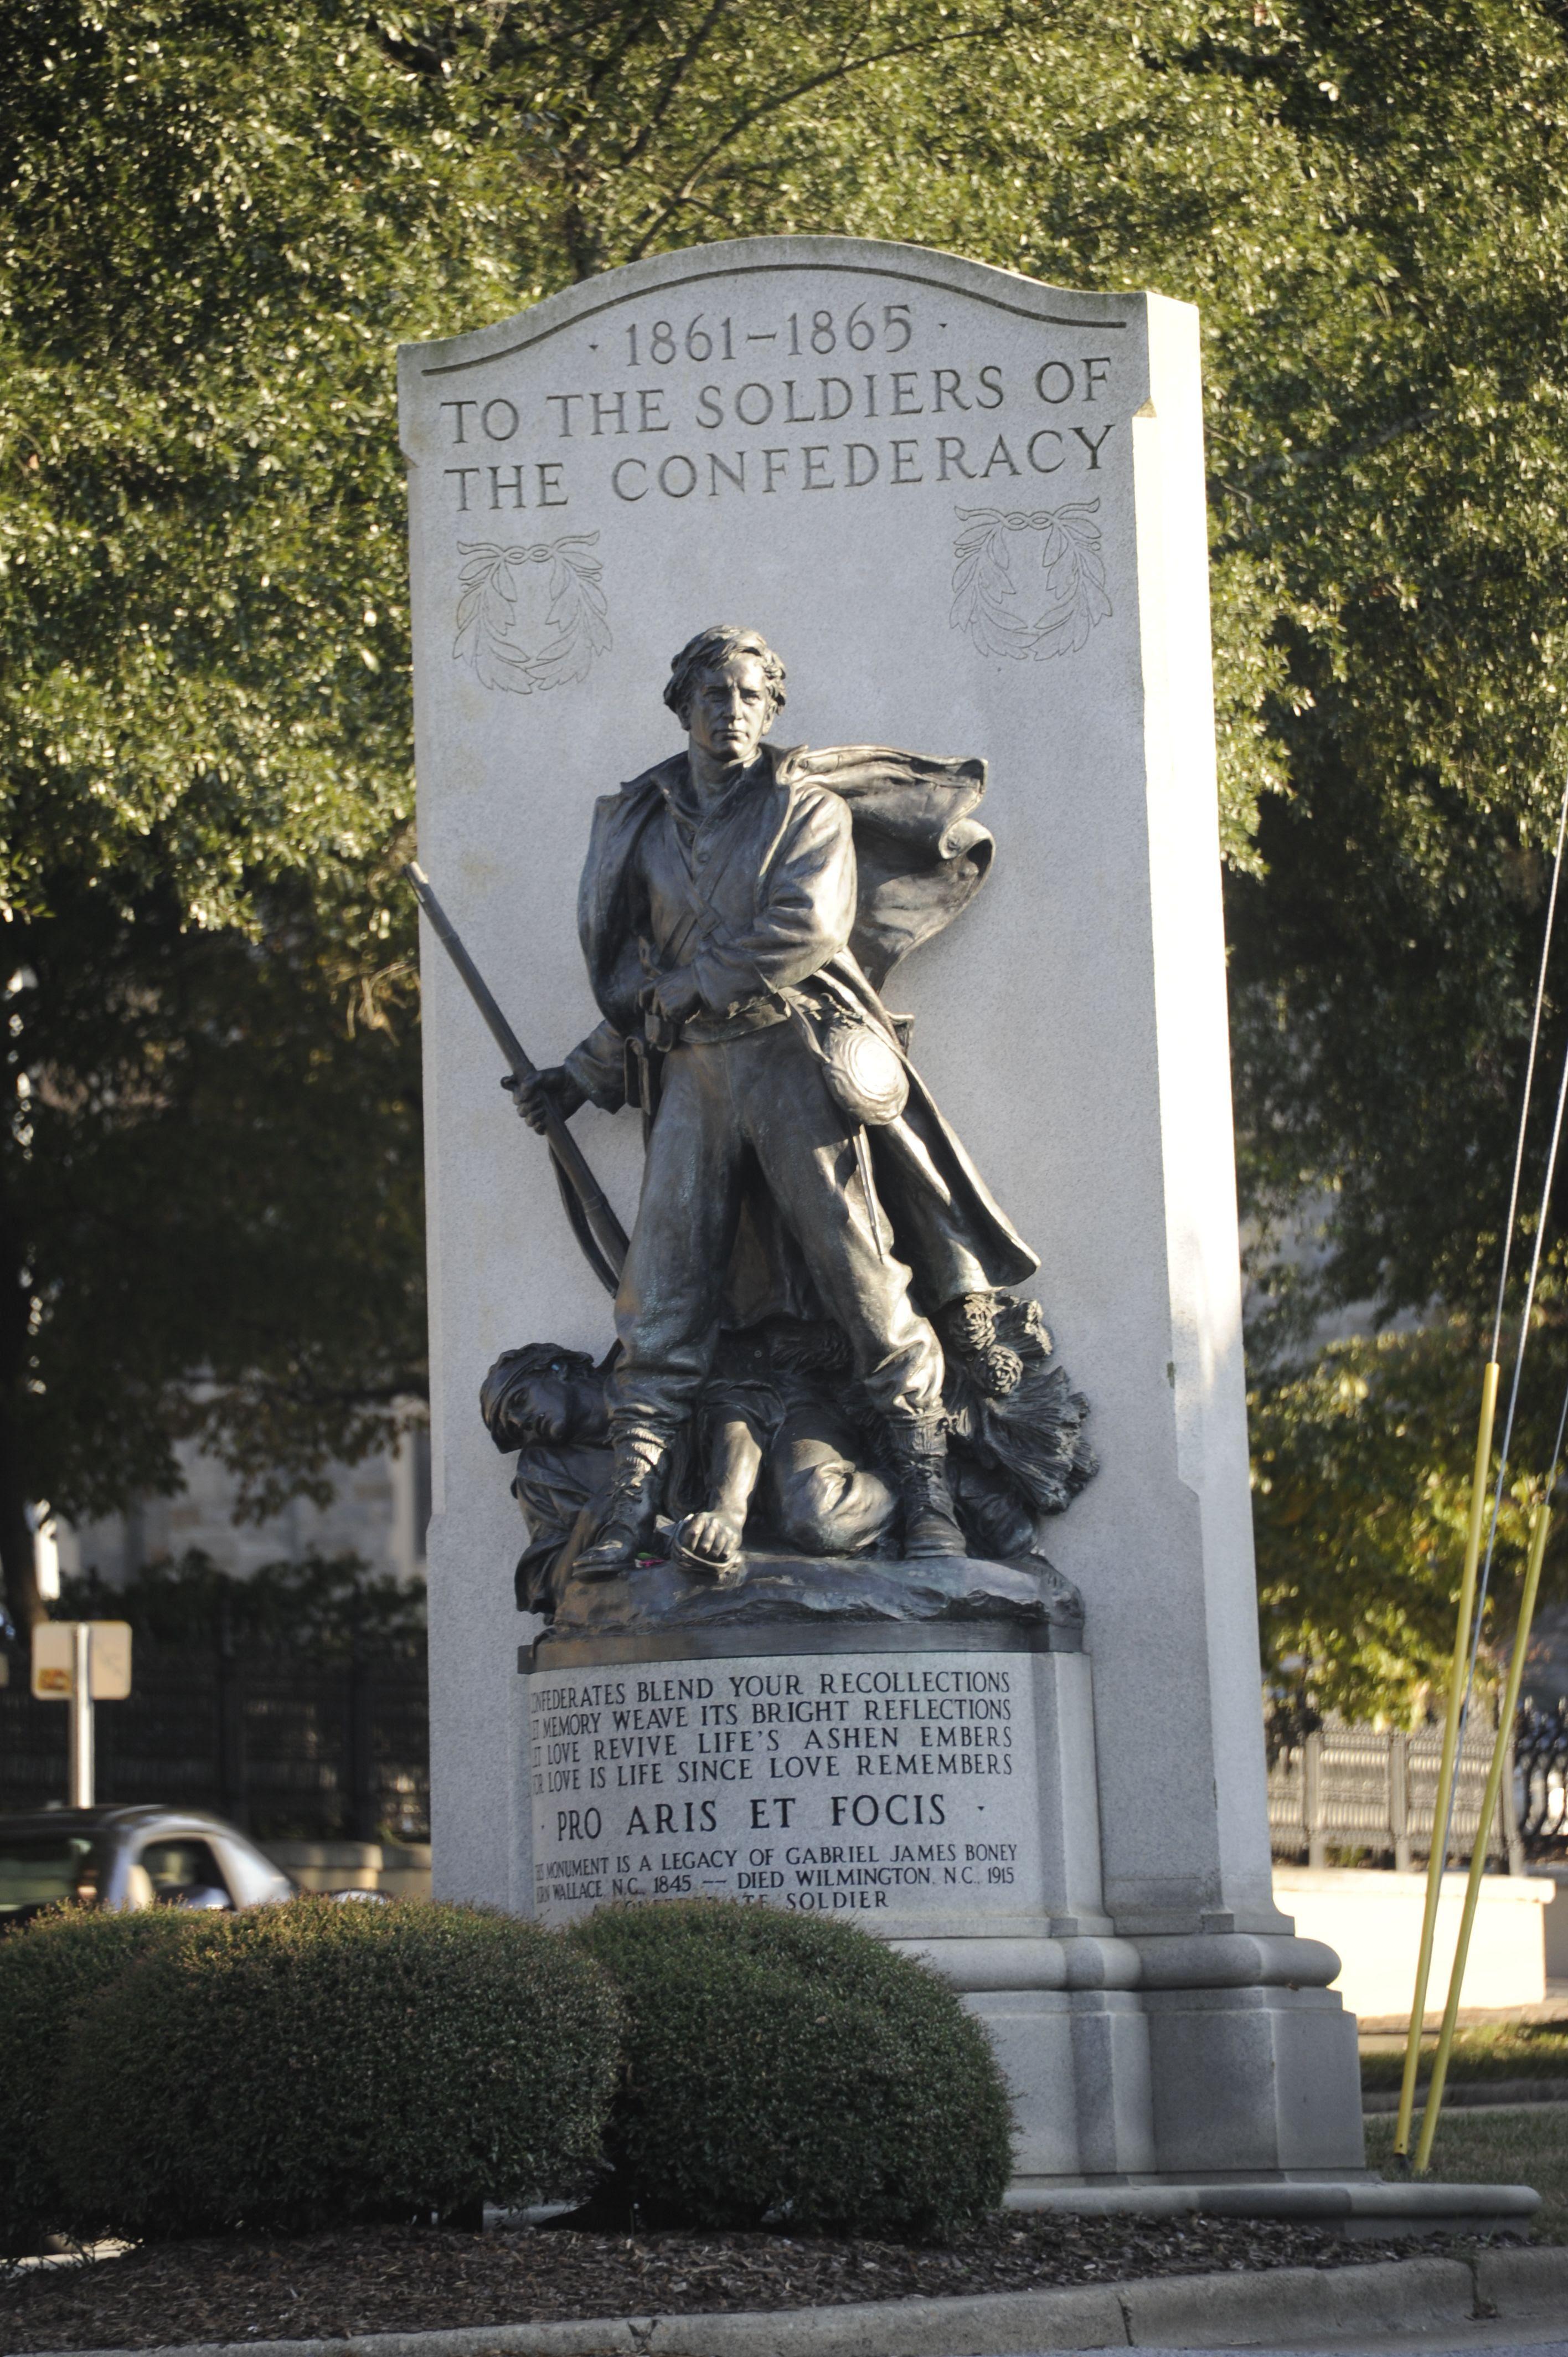 http://theitcountreyjustice.files.wordpress.com/2013/10/wilmington-confederacy-monument.jpg